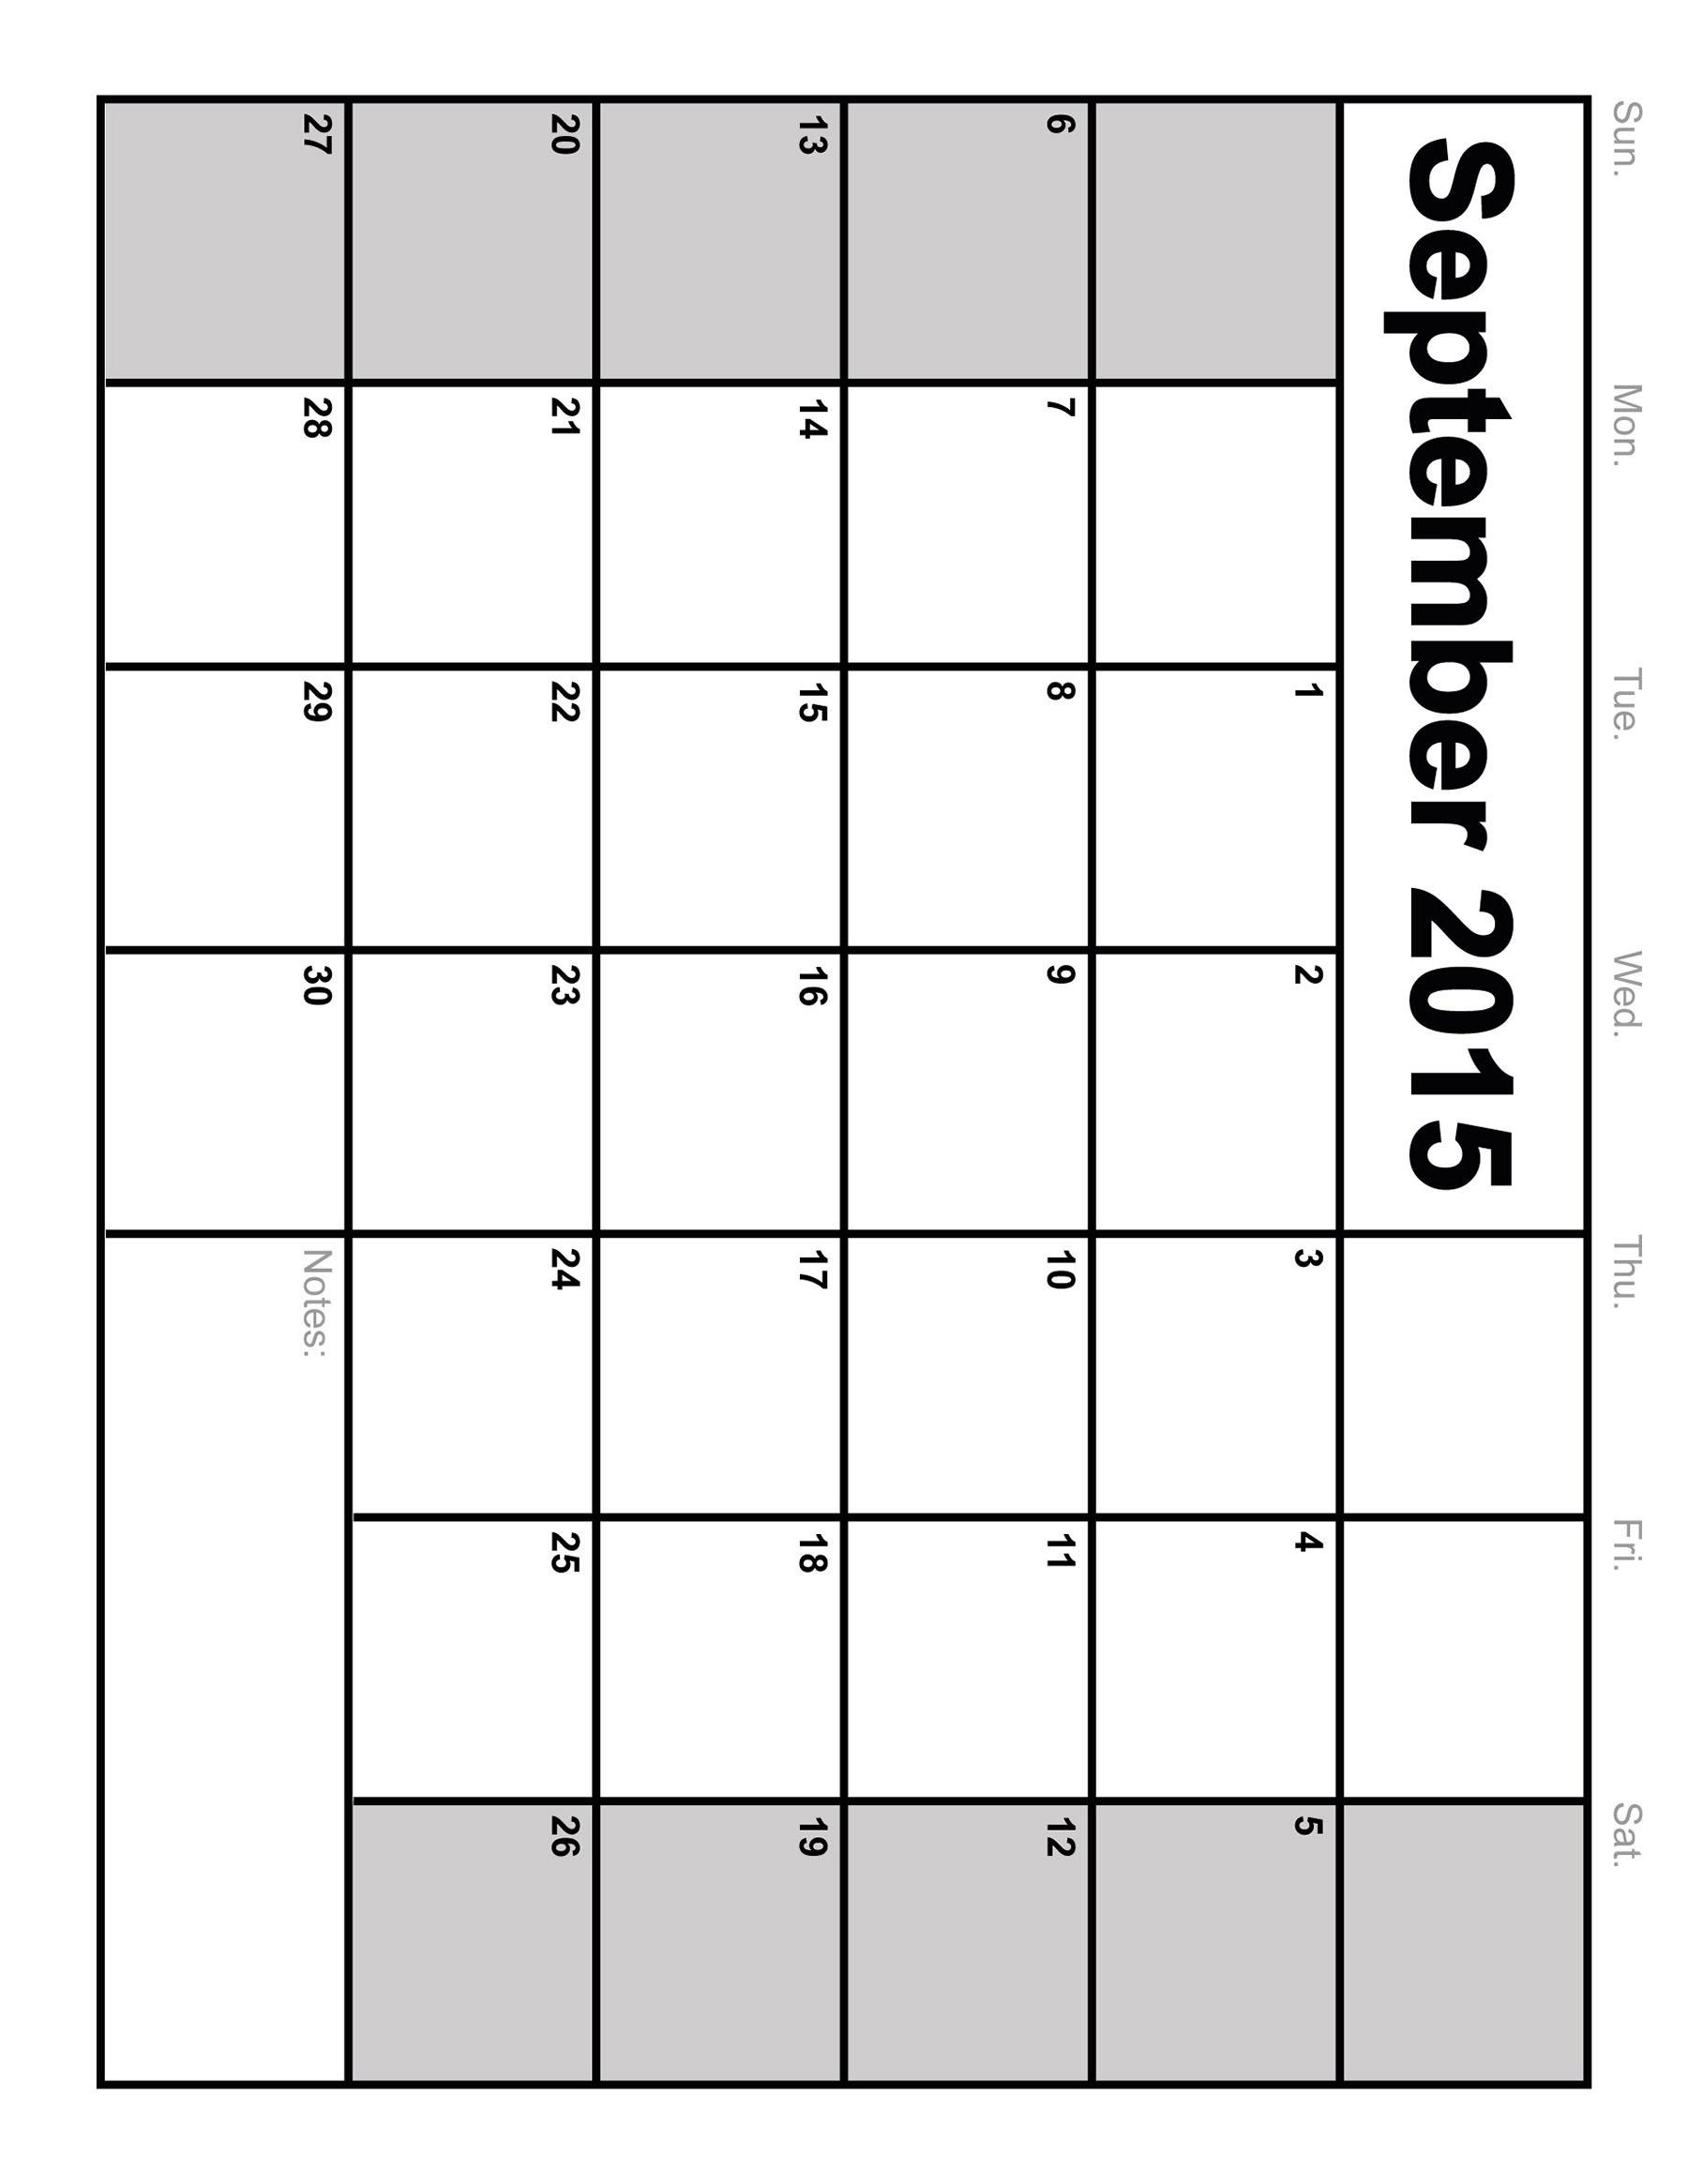 September Calendar Printables : Printable september calendar vatoz atozdevelopment